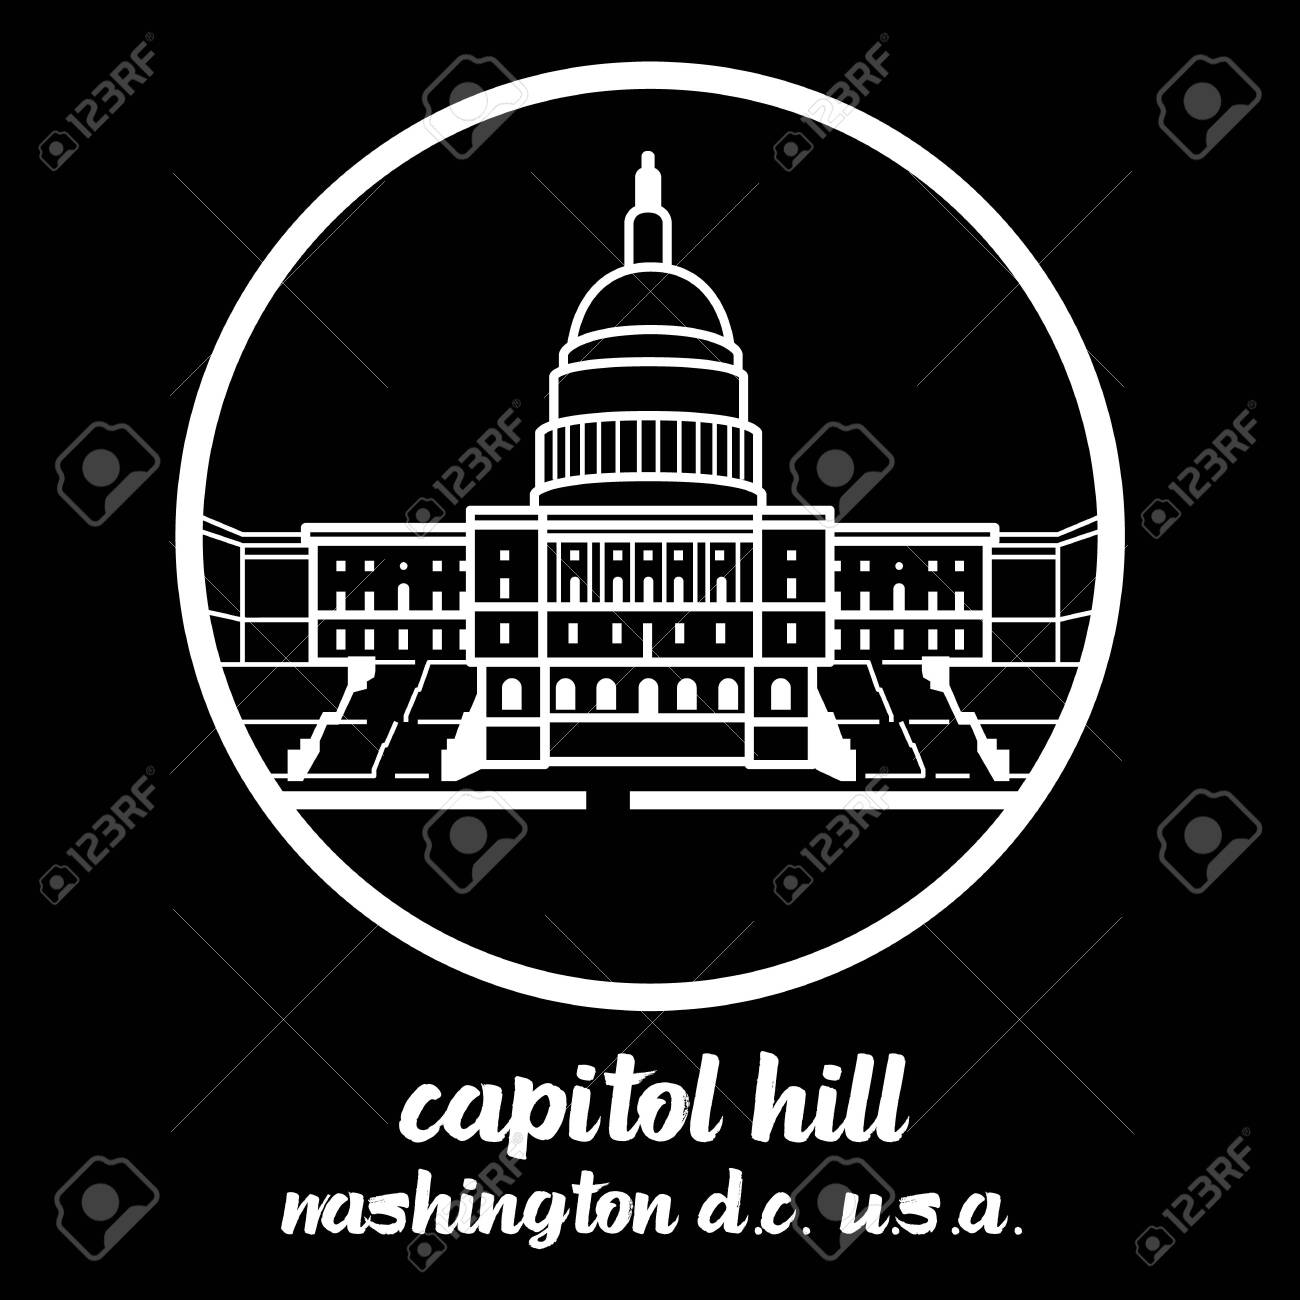 Circle Icon Capitol hill. vector illustration - 133312368